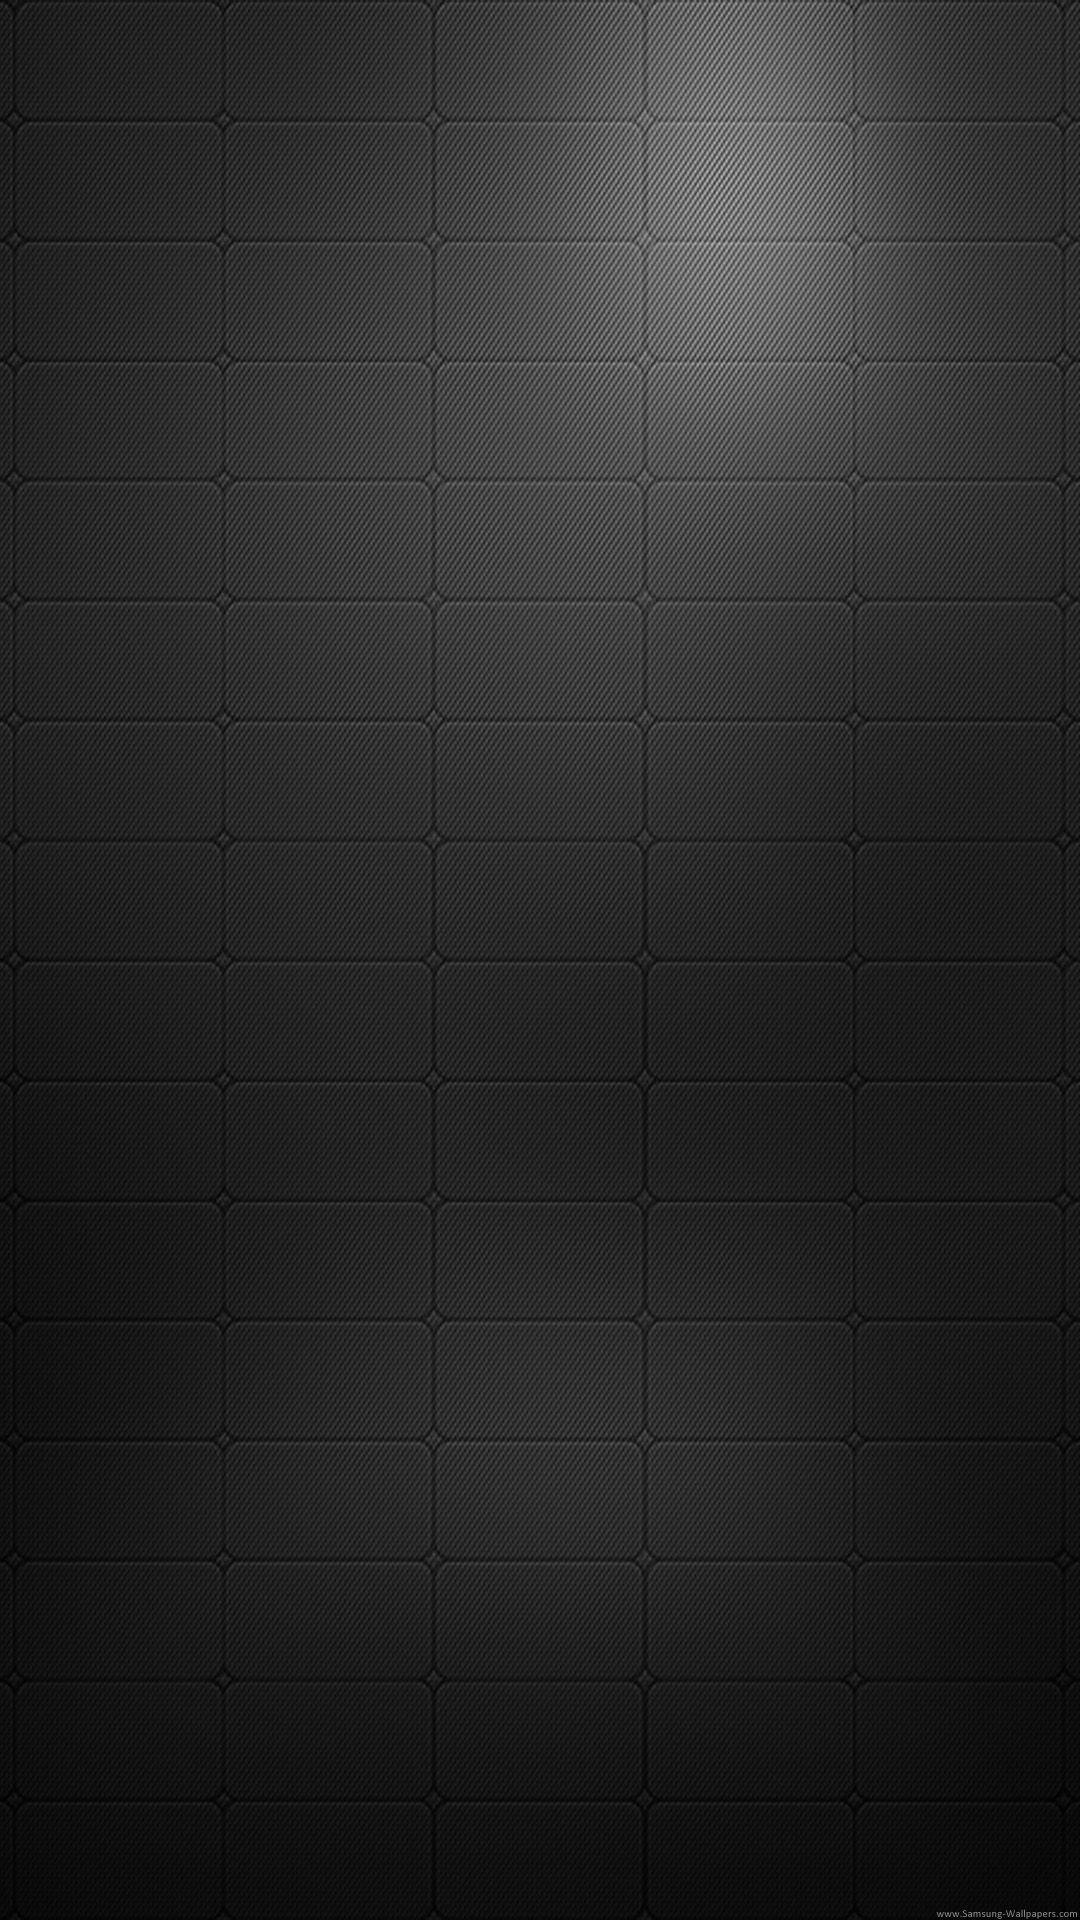 Pin By Brandi H On Phone Backgrounds Grey Wallpaper Iphone Black Screen Screen Wallpaper